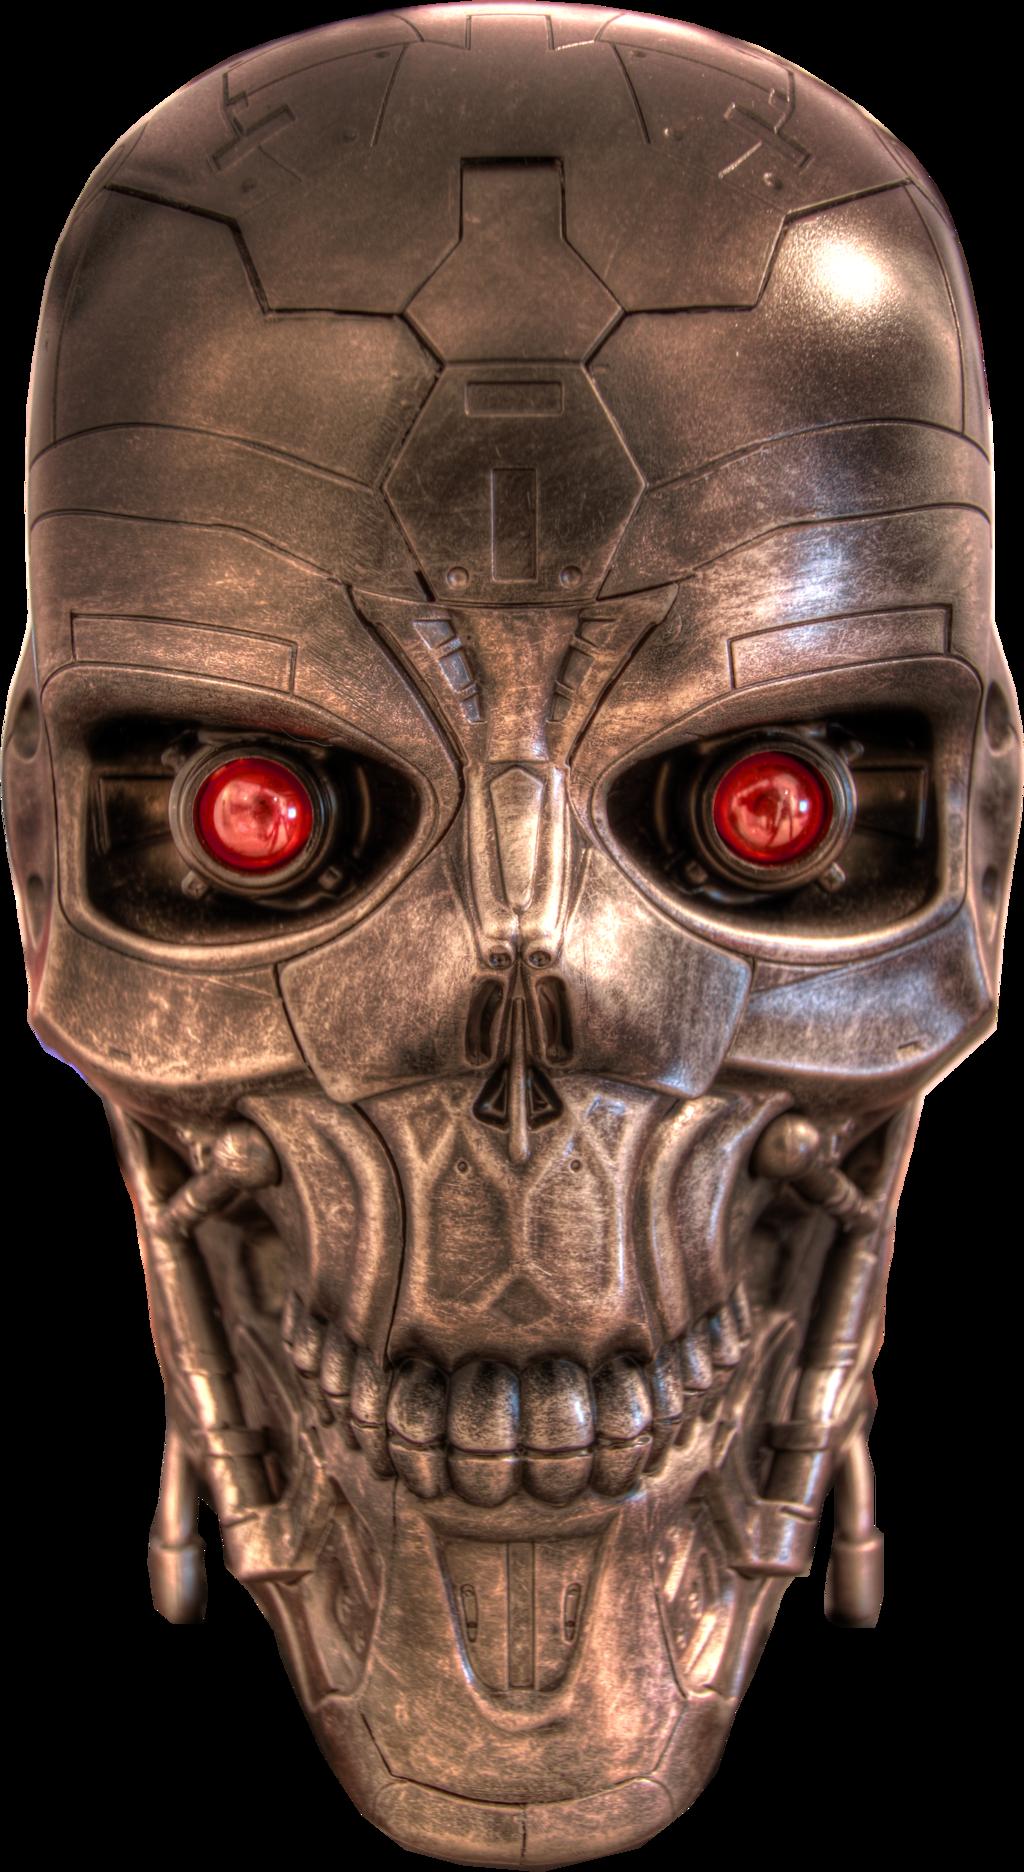 Terminator Skull Png Image Png Images Skull Terminator